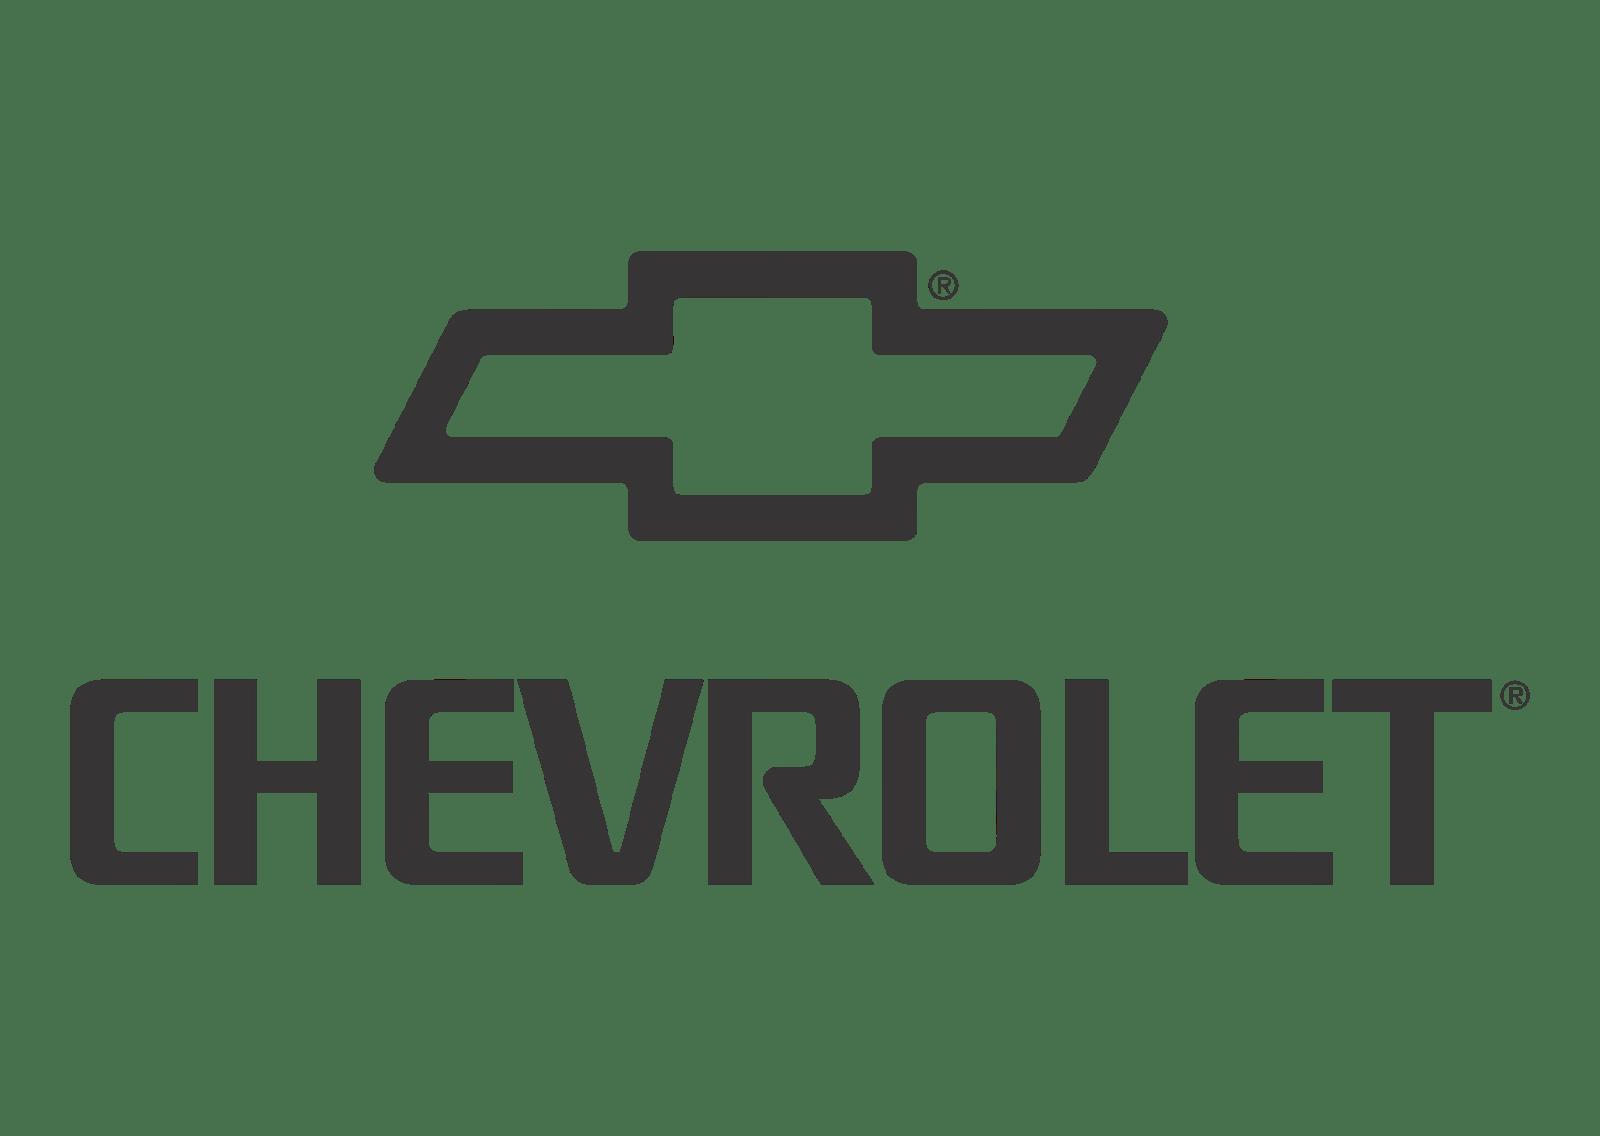 11 Chevrolet Vector Car Images